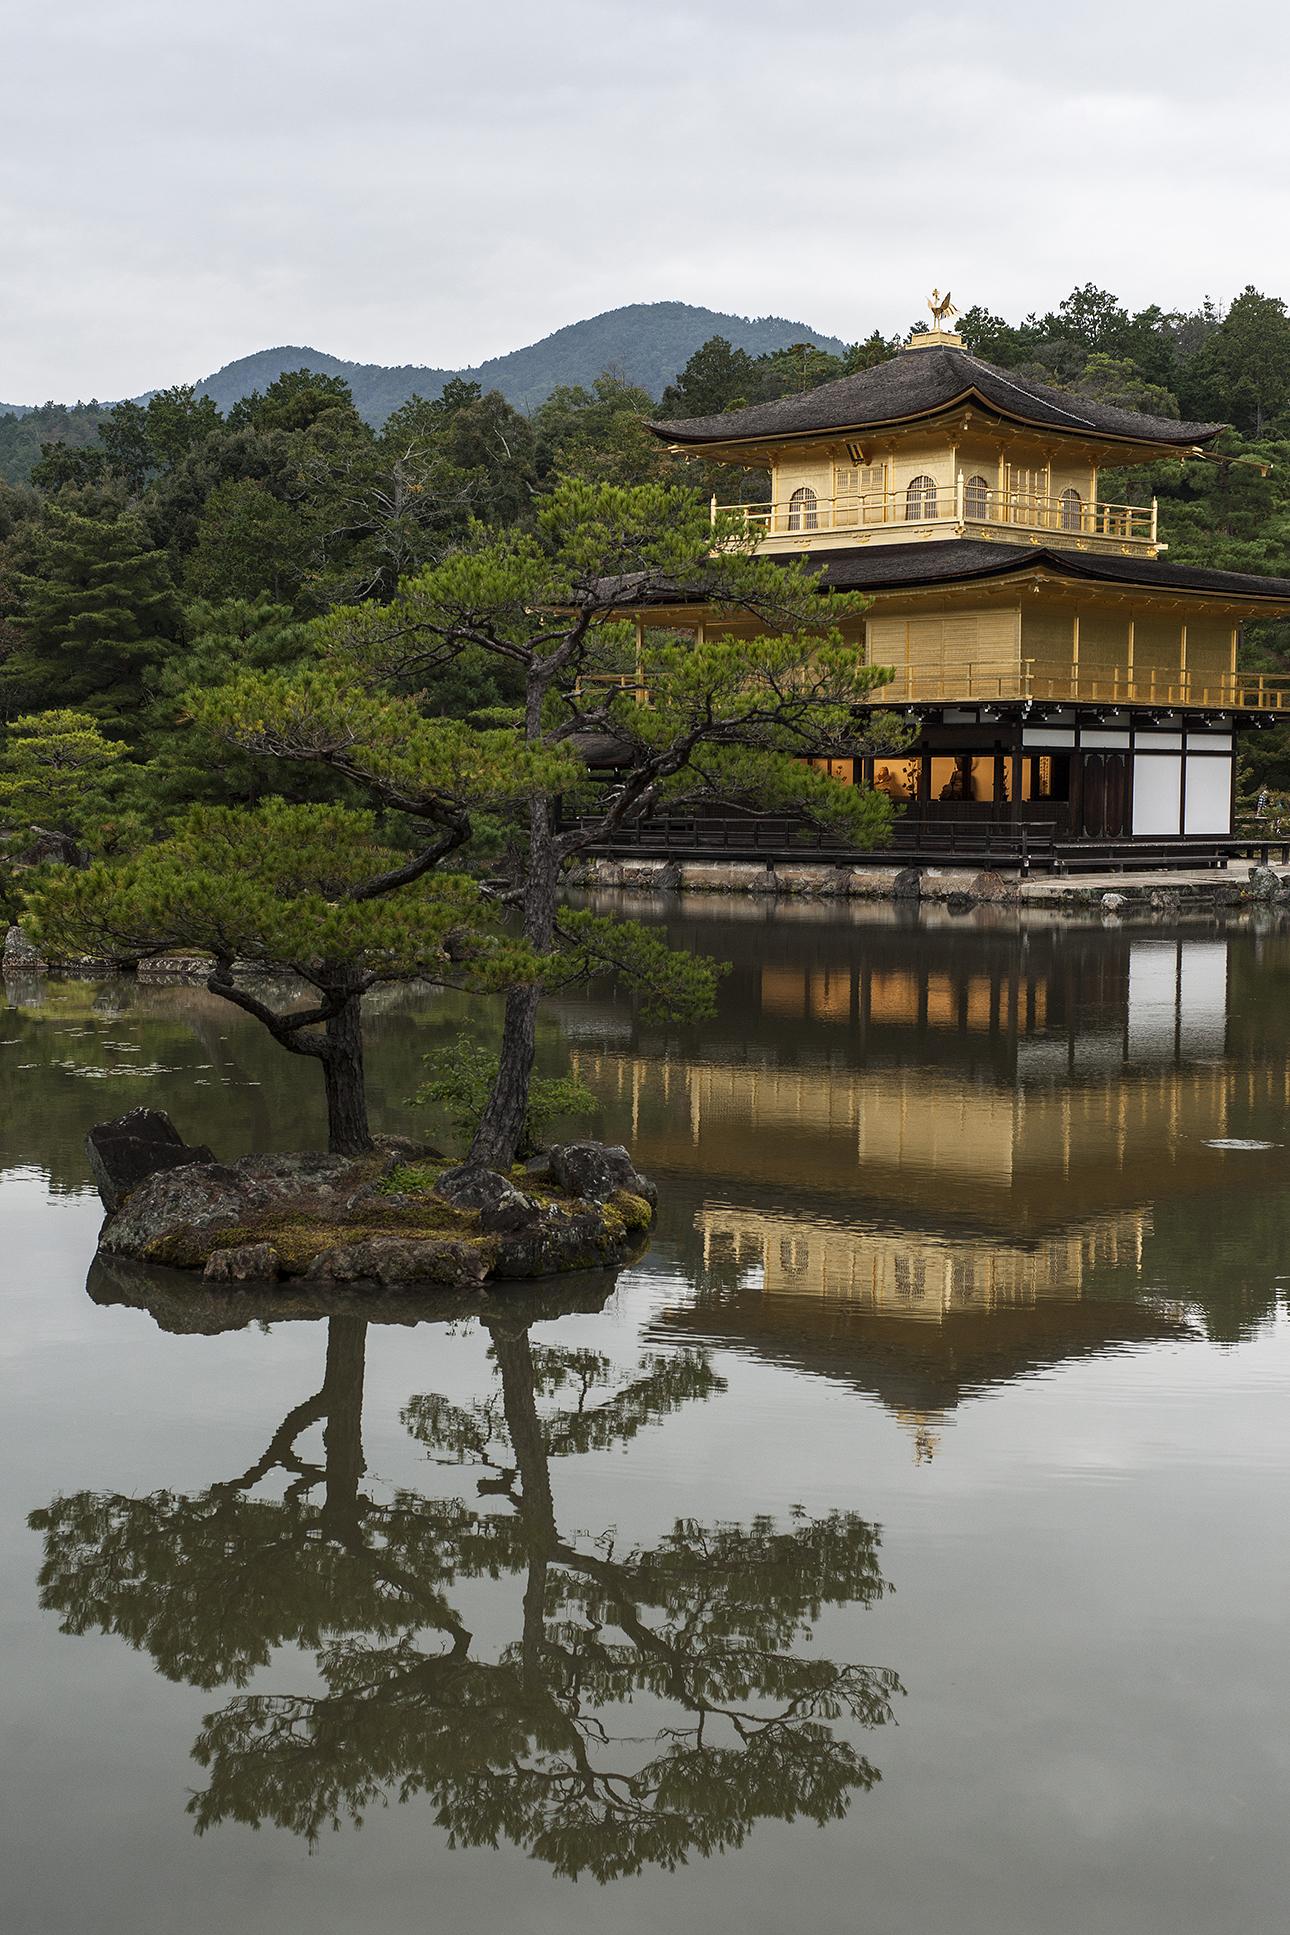 Japon_1290.jpg